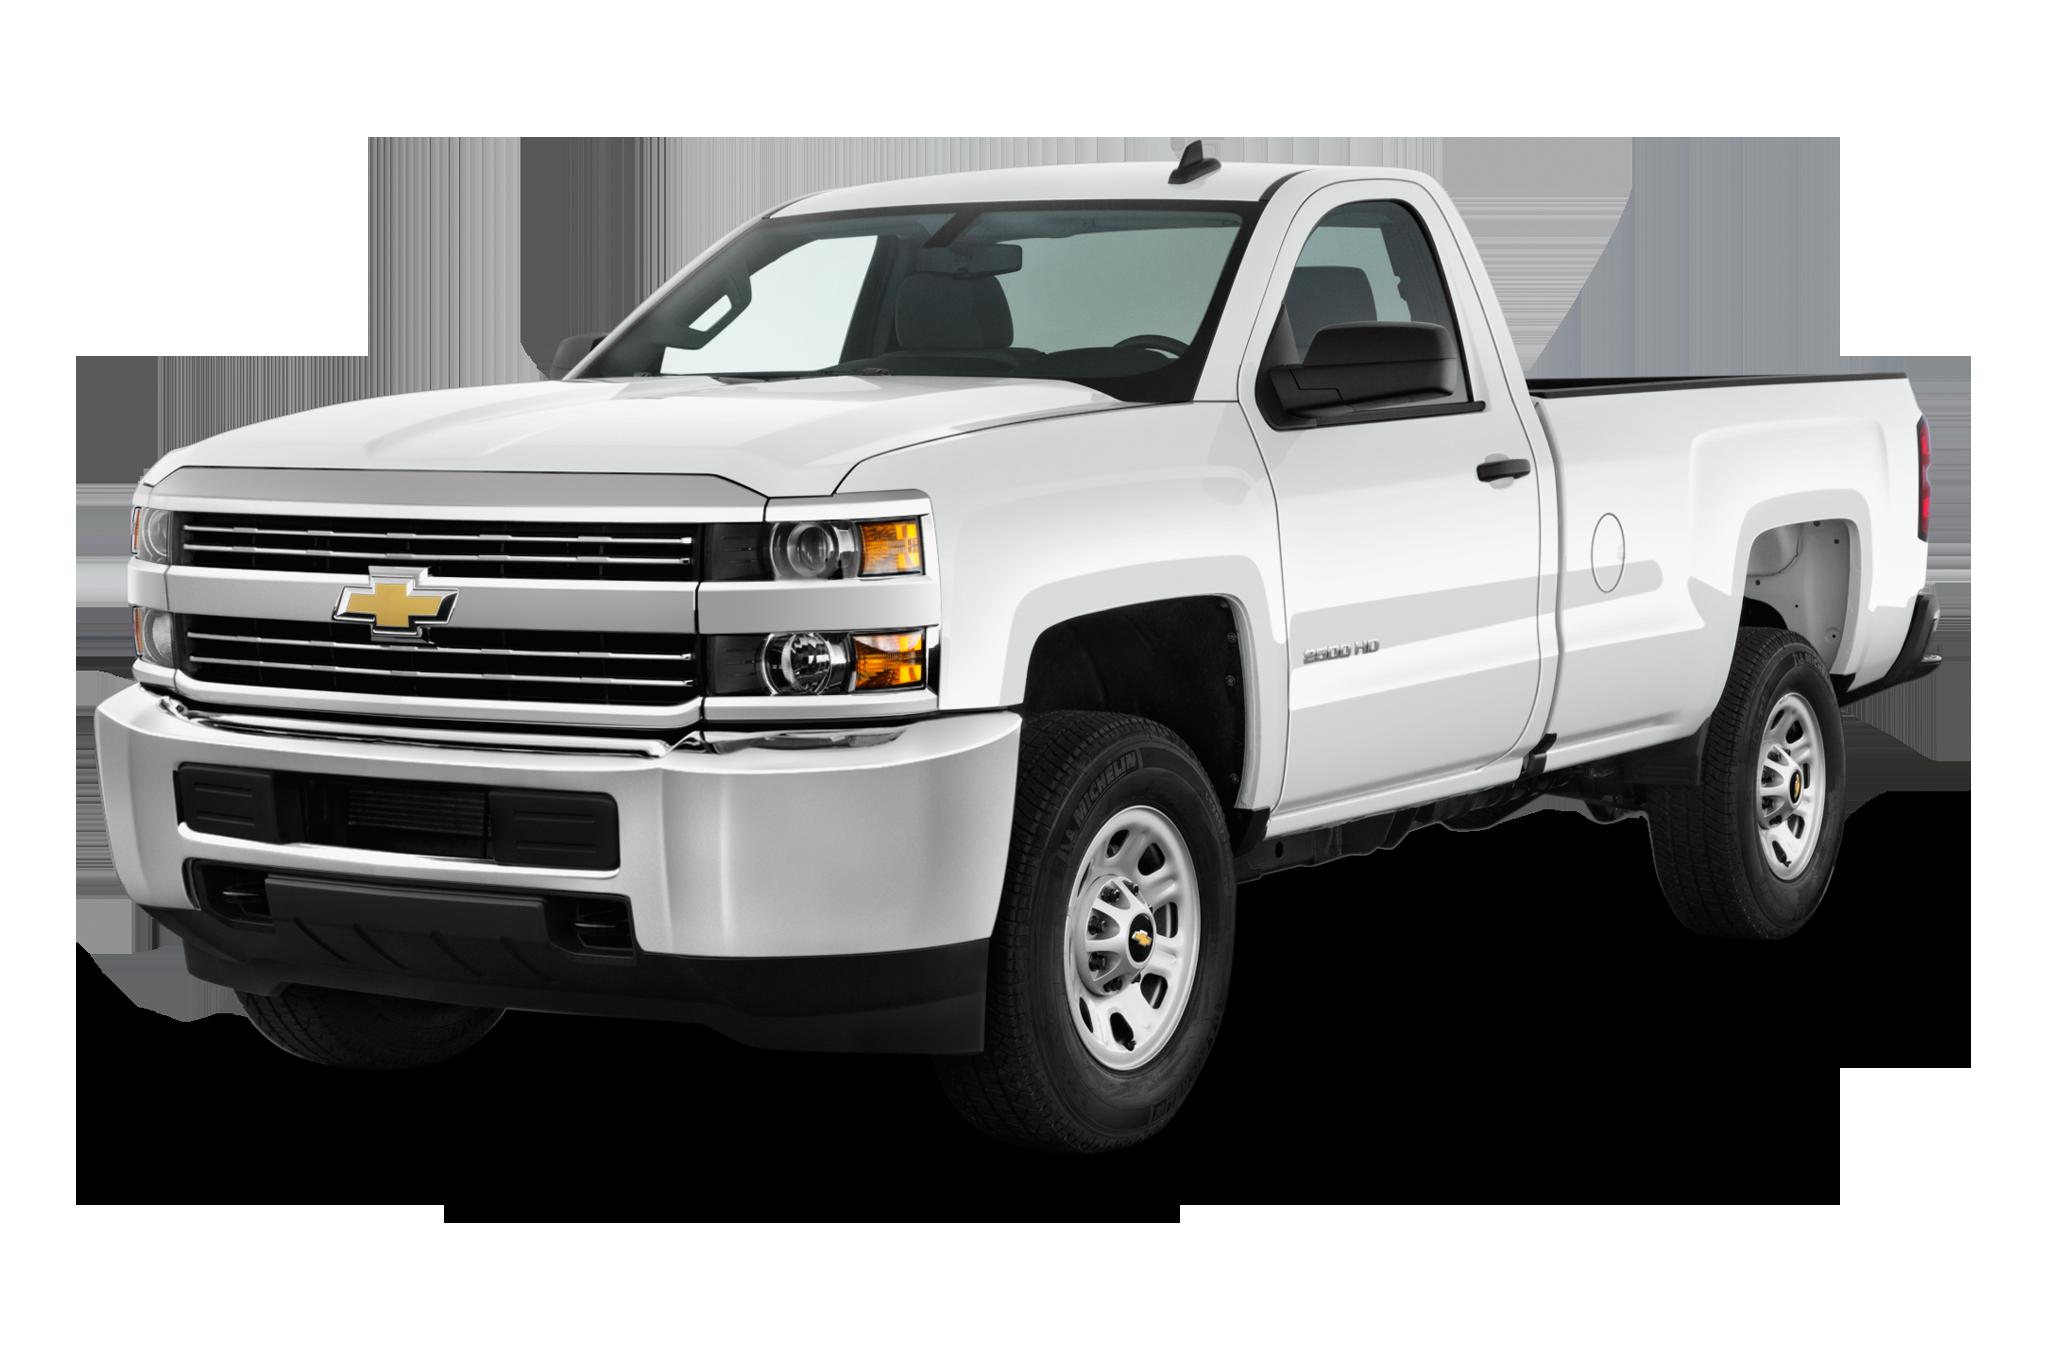 2018 Chevrolet Silverado 2500HD WT Regular Cab Long Box Engine, transmission and performance ...